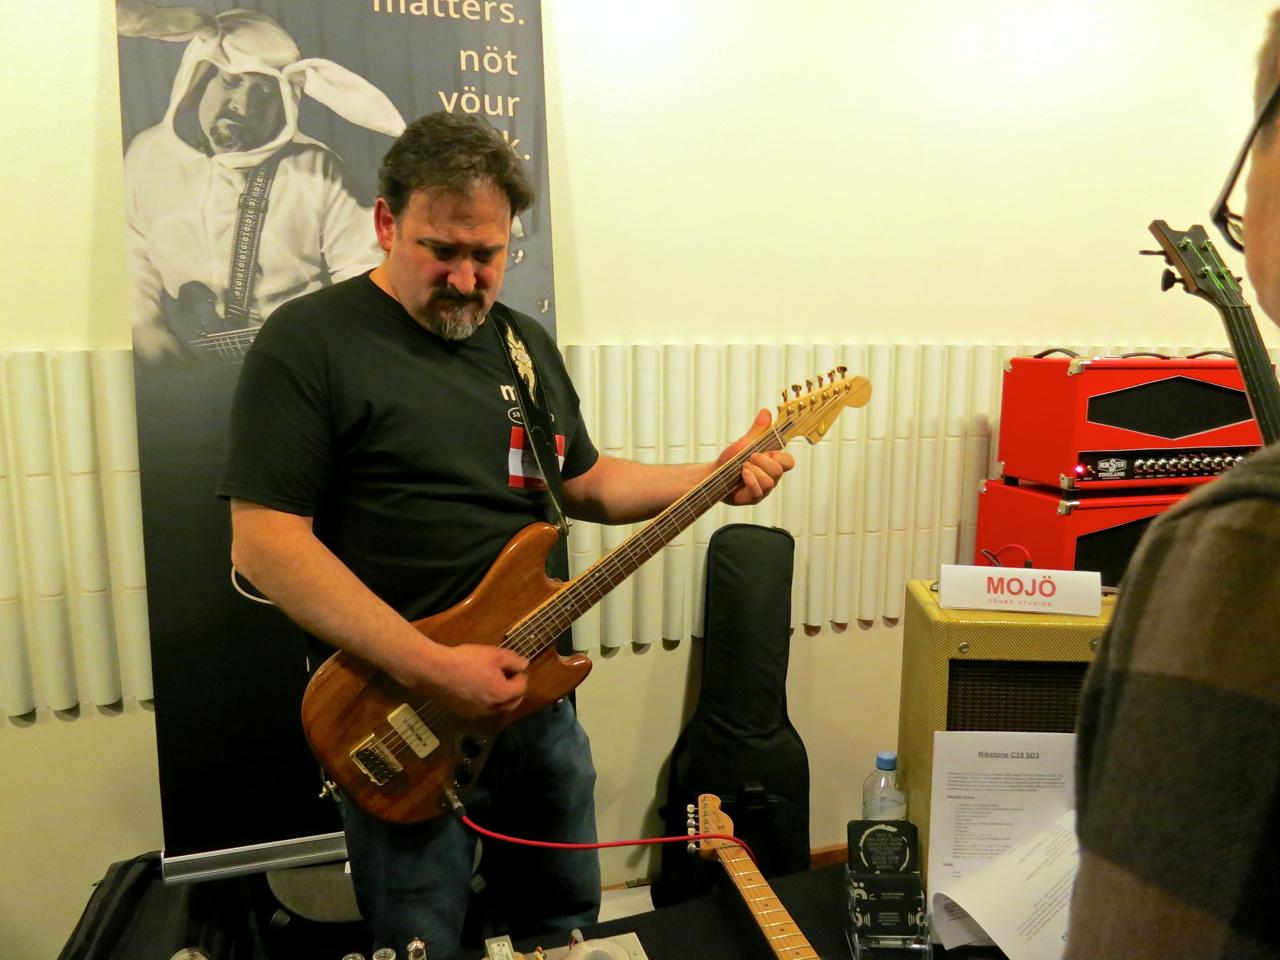 Tonefest 2019 – Möjö Guitars.jpg